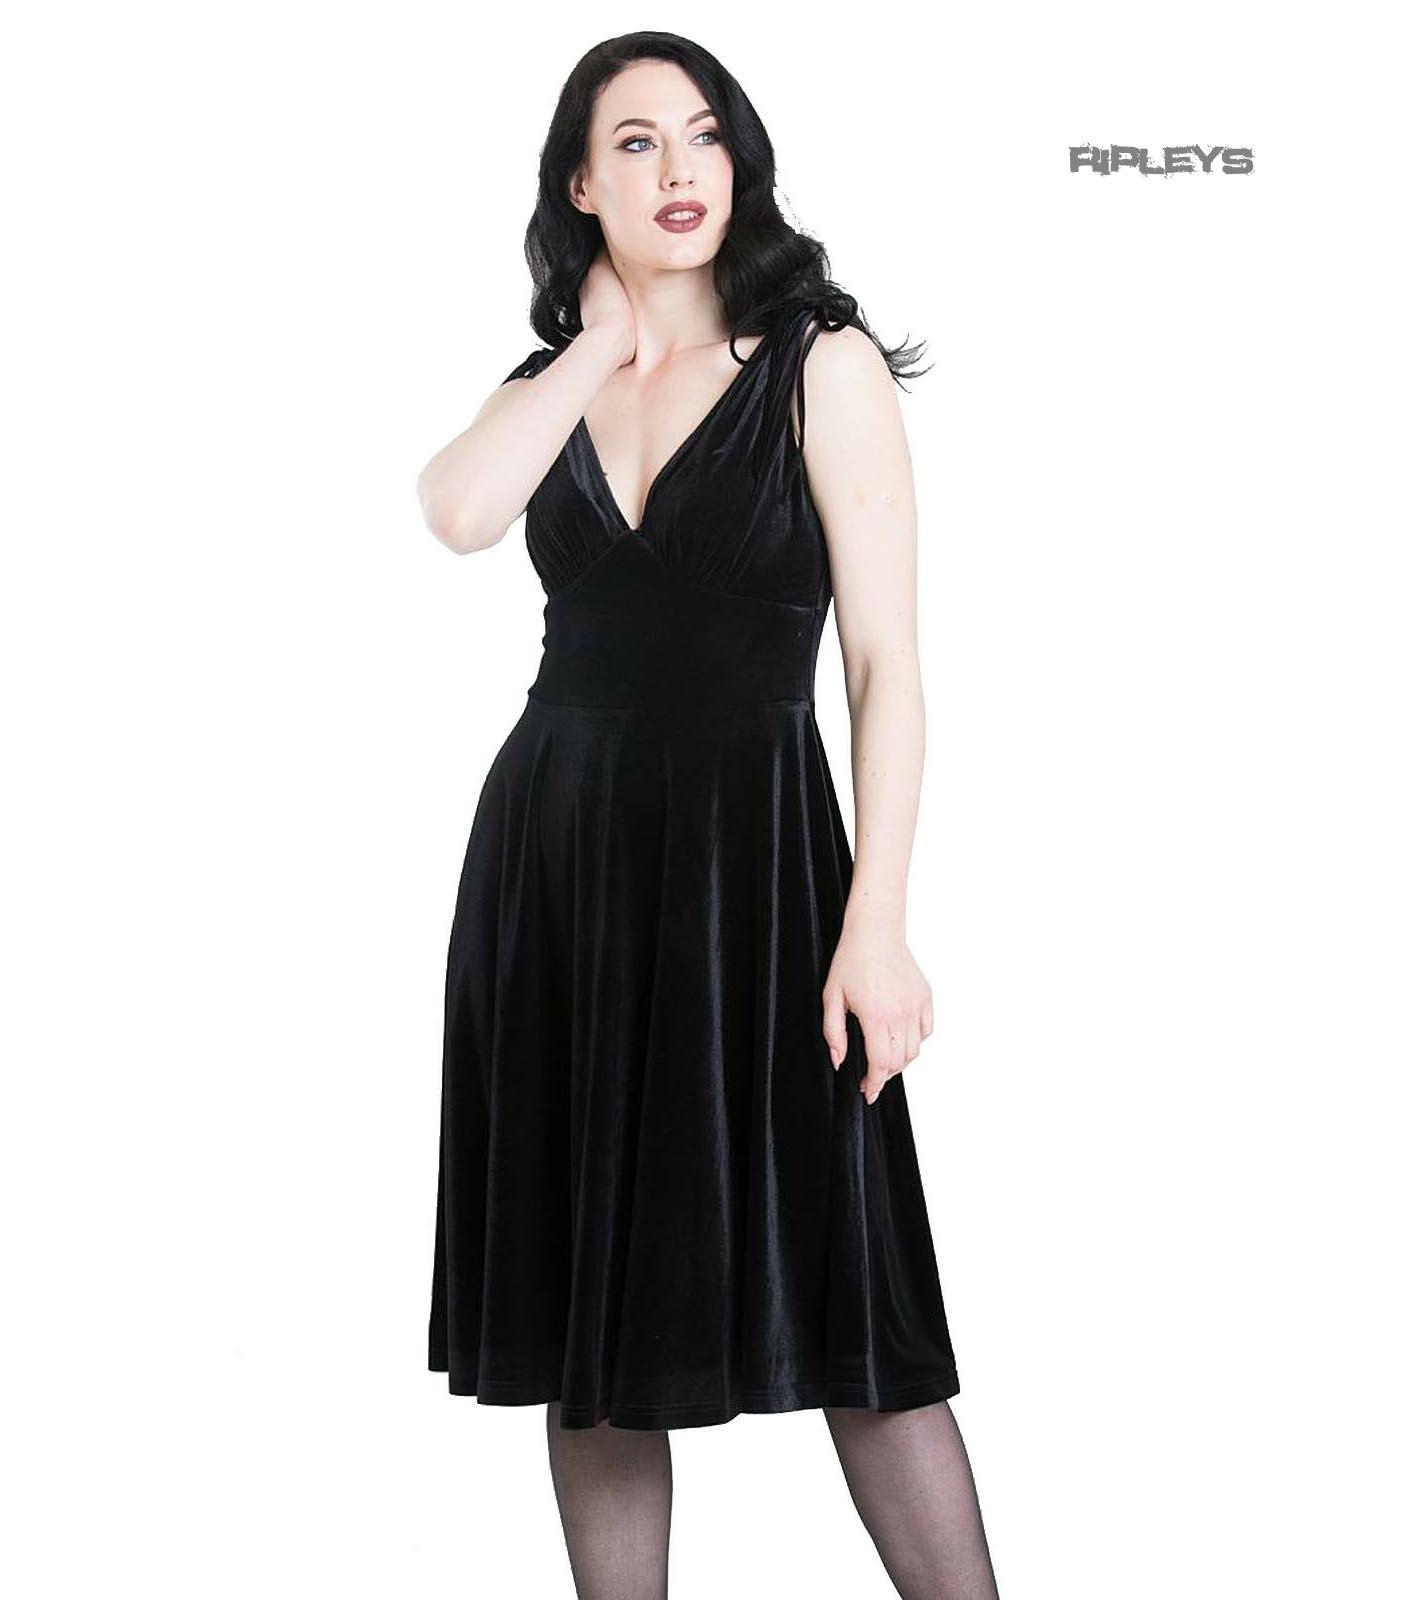 Hell-Bunny-40s-50s-Elegant-Pin-Up-Dress-MELINA-Crushed-Velvet-Black-All-Sizes thumbnail 10